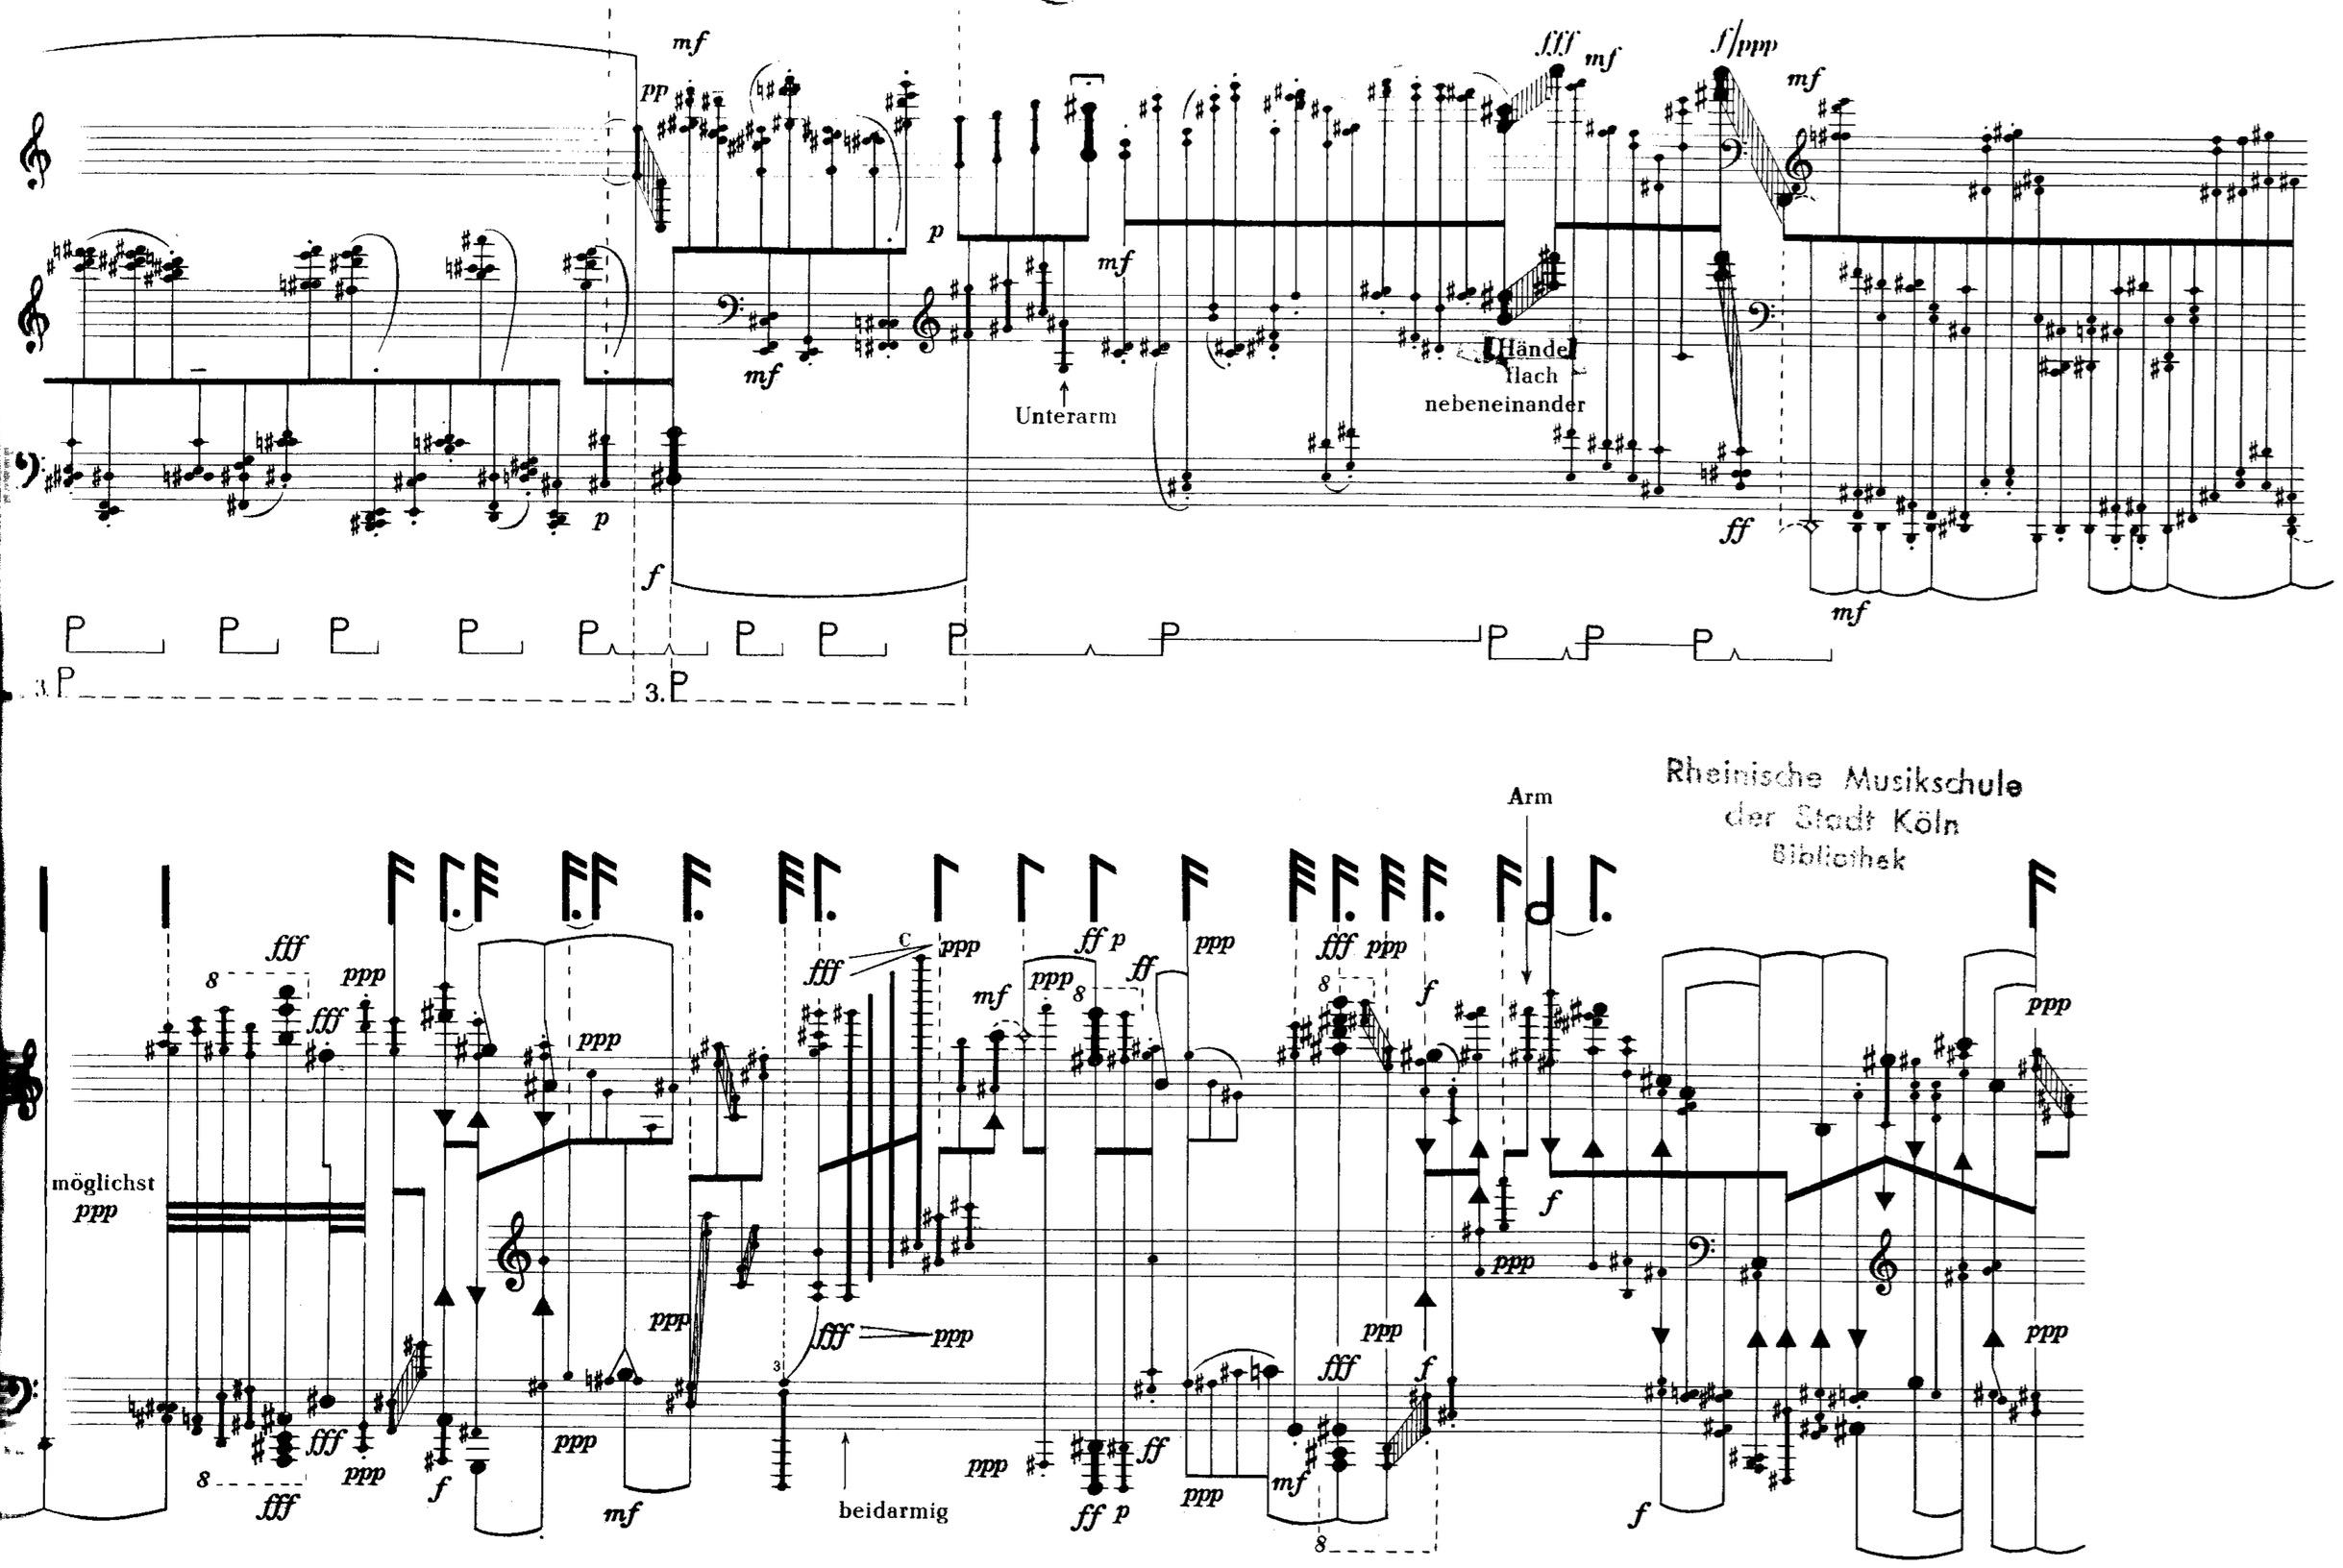 Salvatore Sciarrino Piano Sonatas 1976 1994 Notes Diagram With Screen Shot 2014 10 29 At 101315 Am